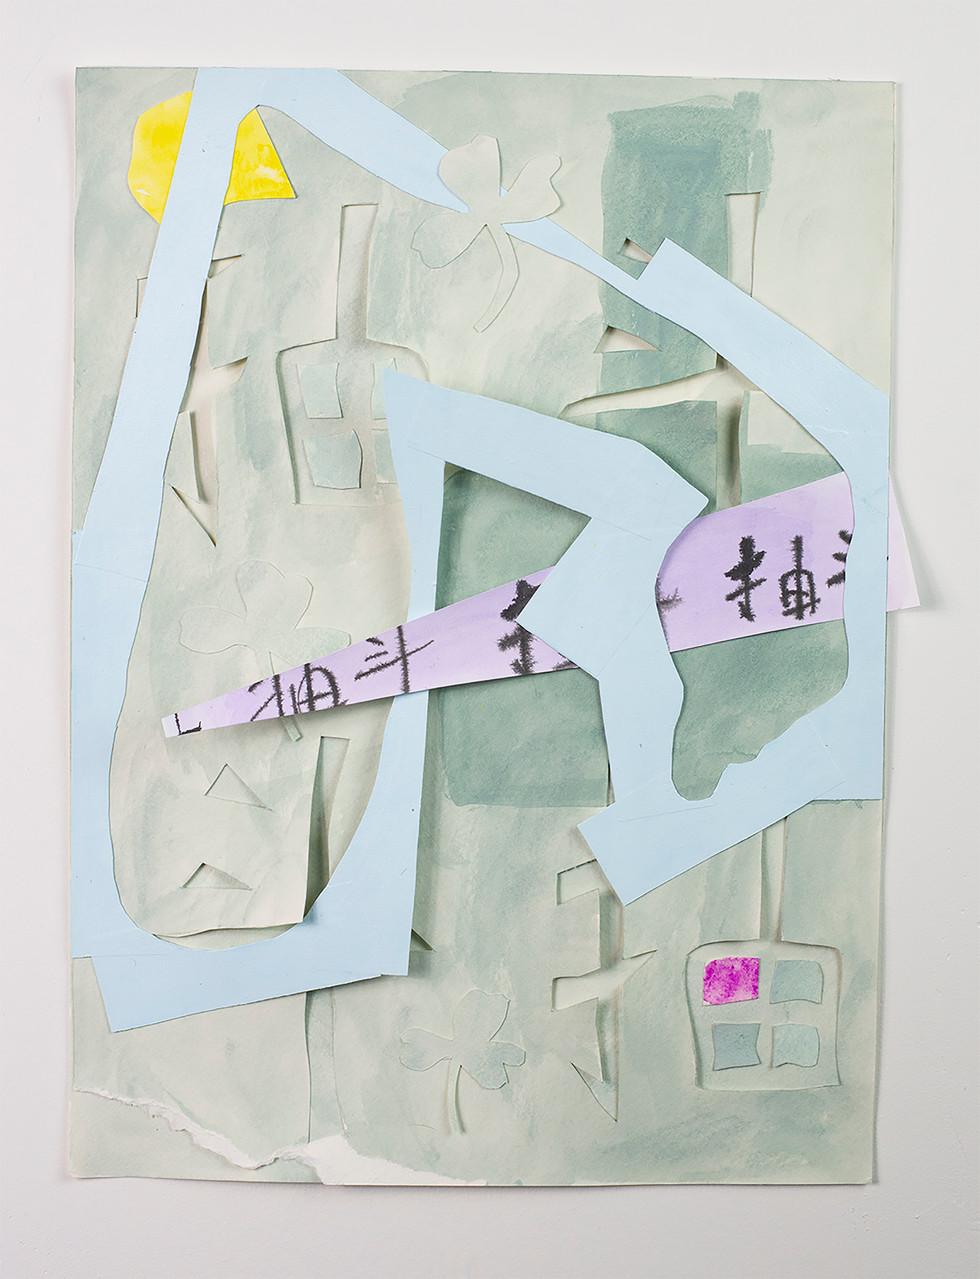 Acrylic gouache, acrylic, paper, masking tape on yupo paper.